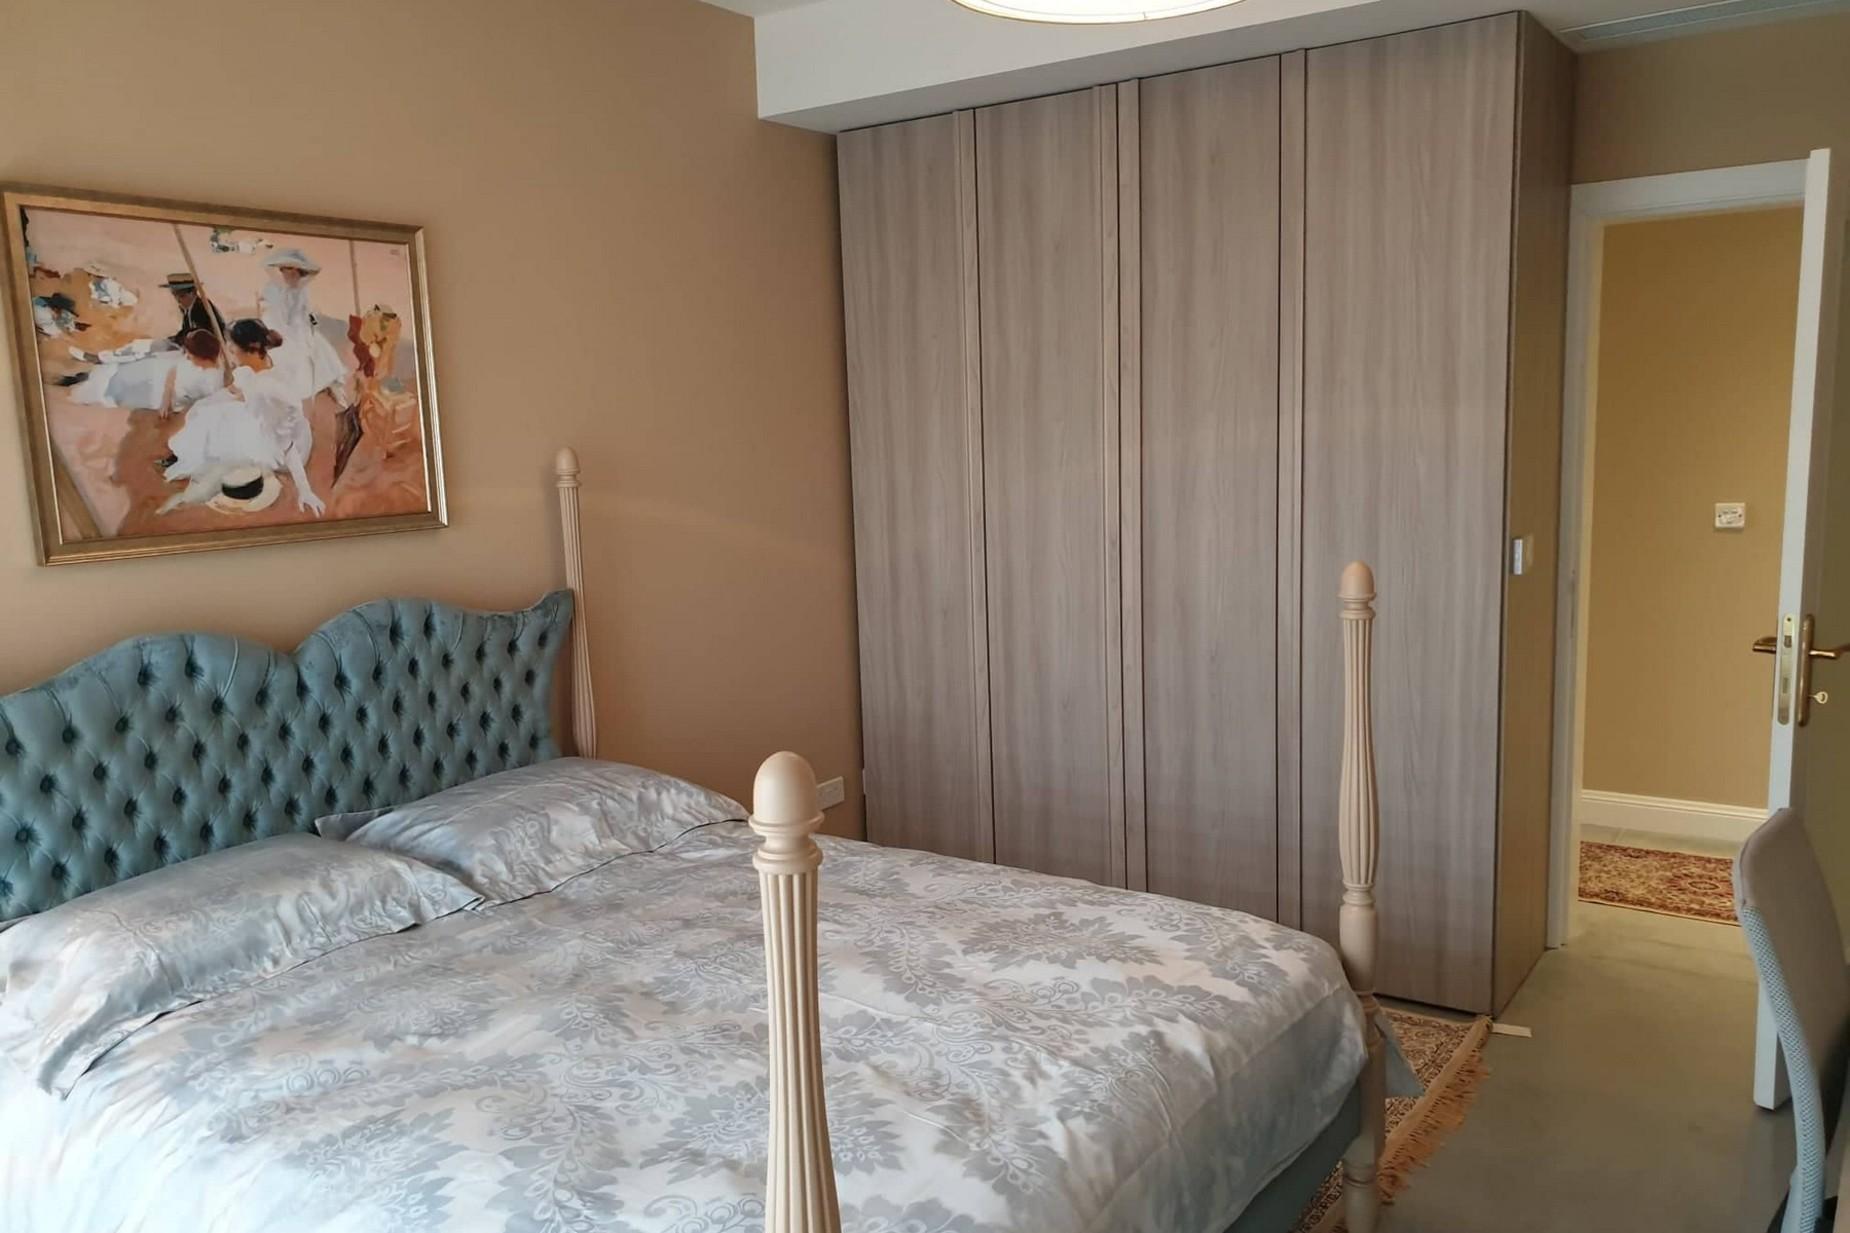 3 bed Apartment For Rent in Birkirkara, Birkirkara - thumb 17